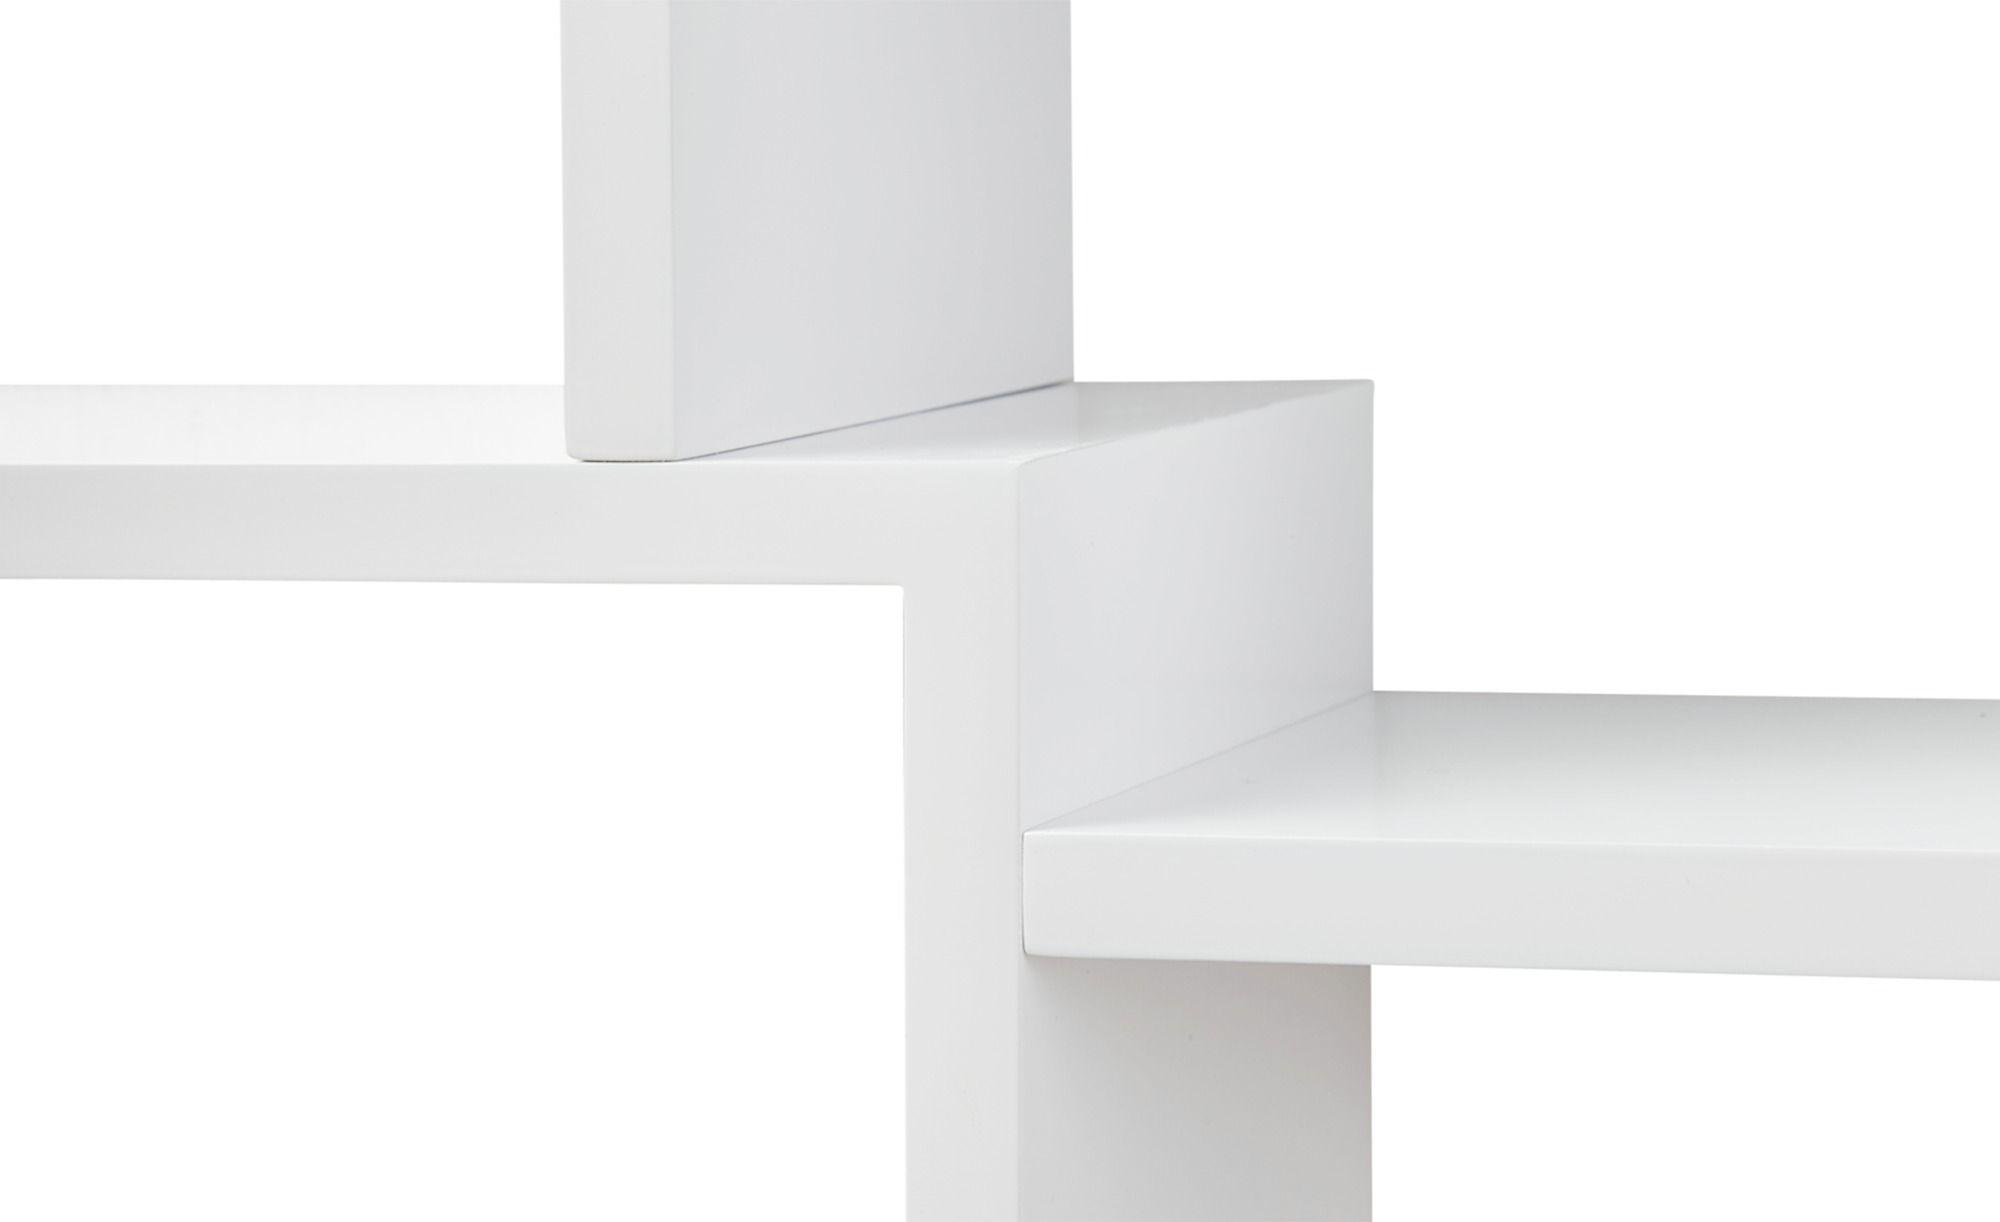 Pin On Wohndesign Wohmzimmer